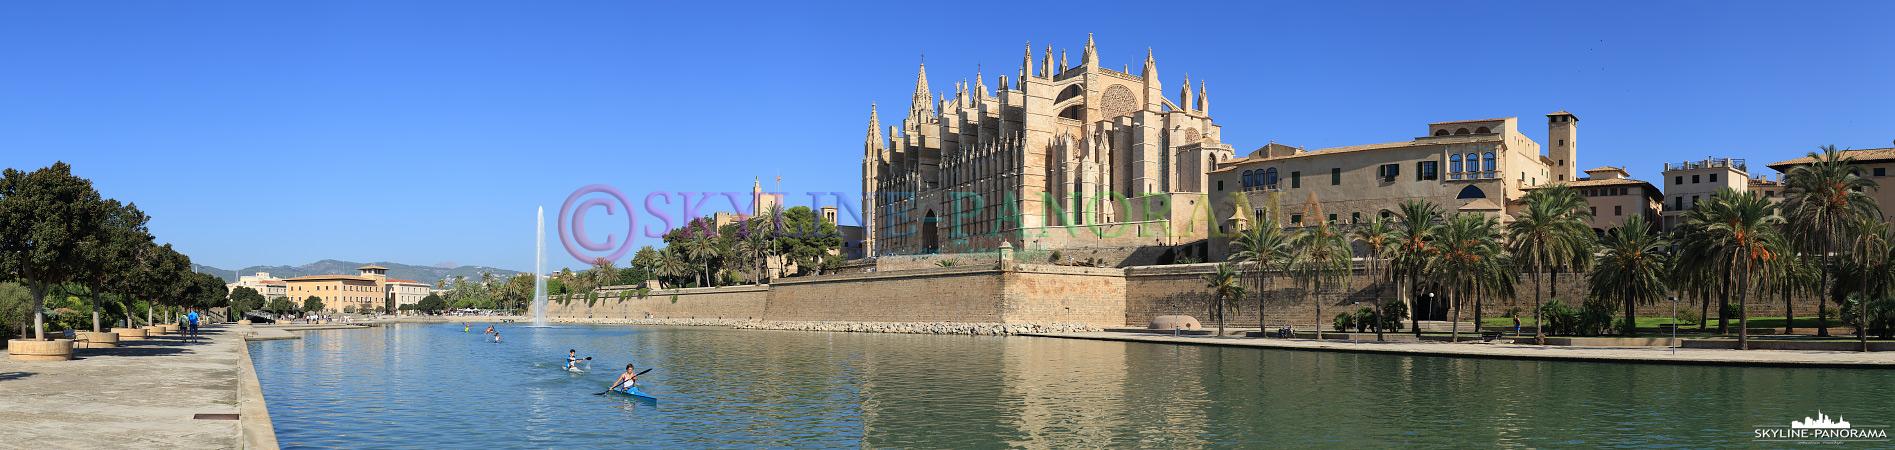 Palma - Mallorca